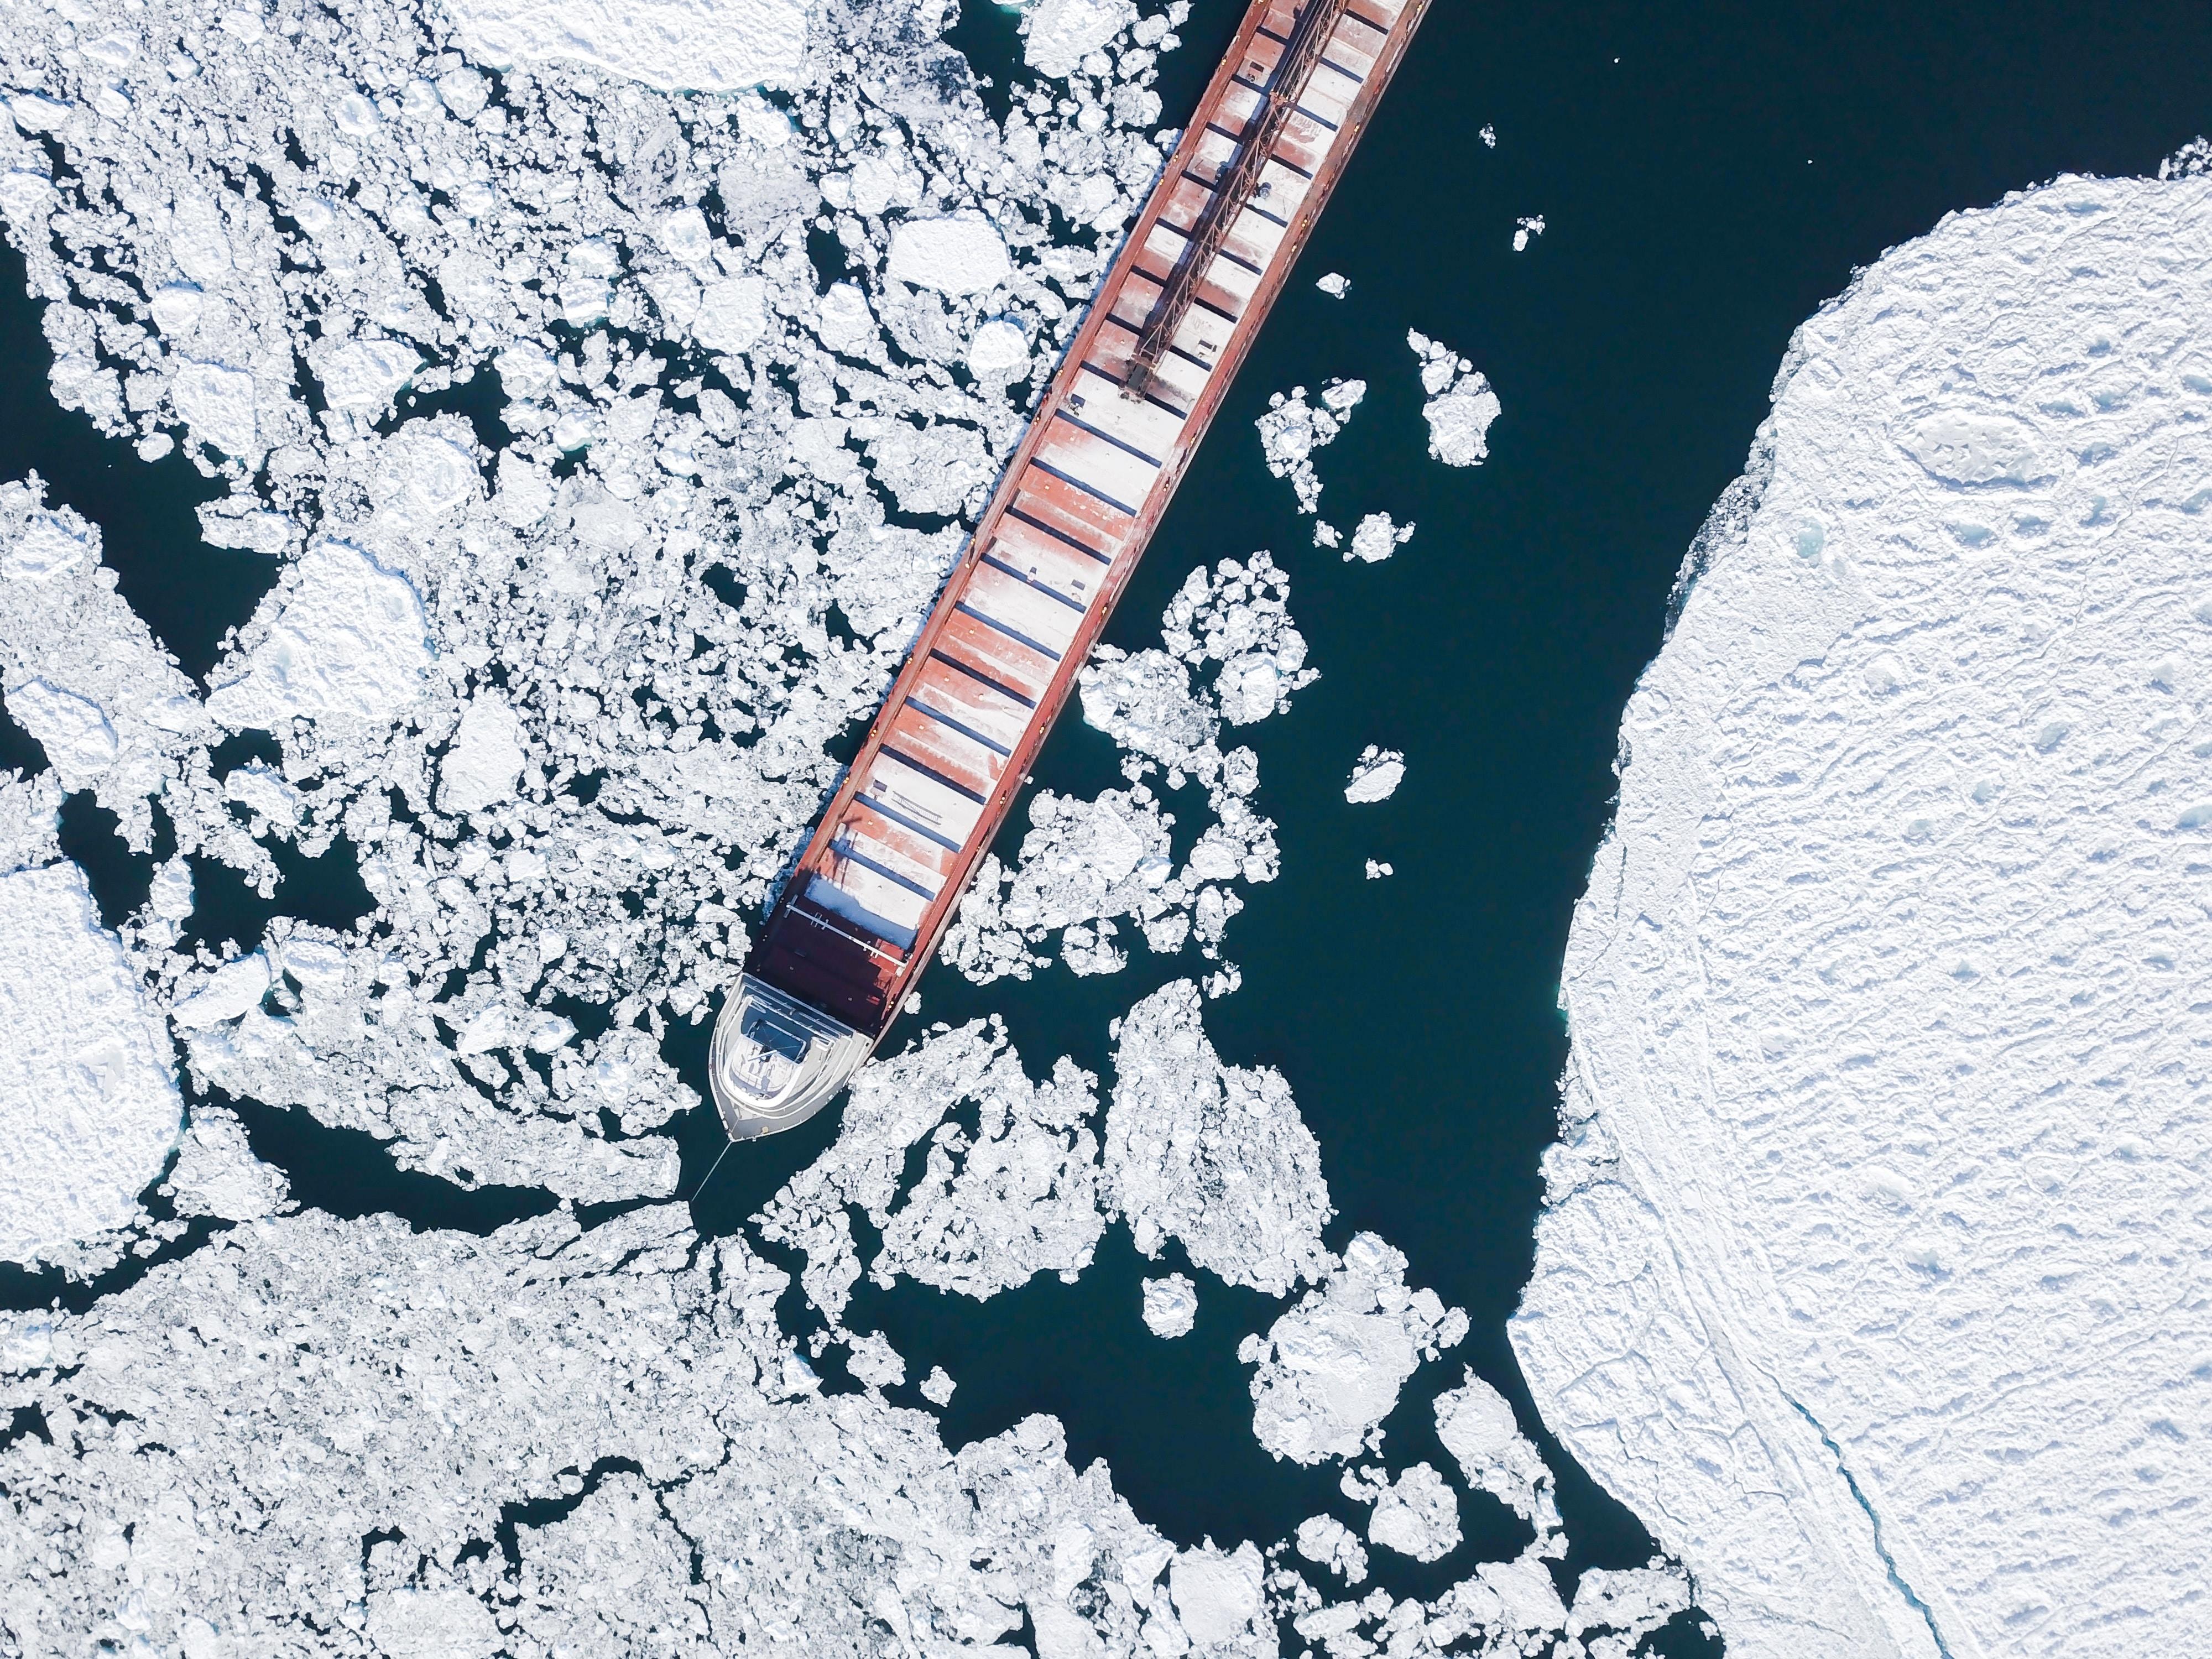 container ship crashing iceberg